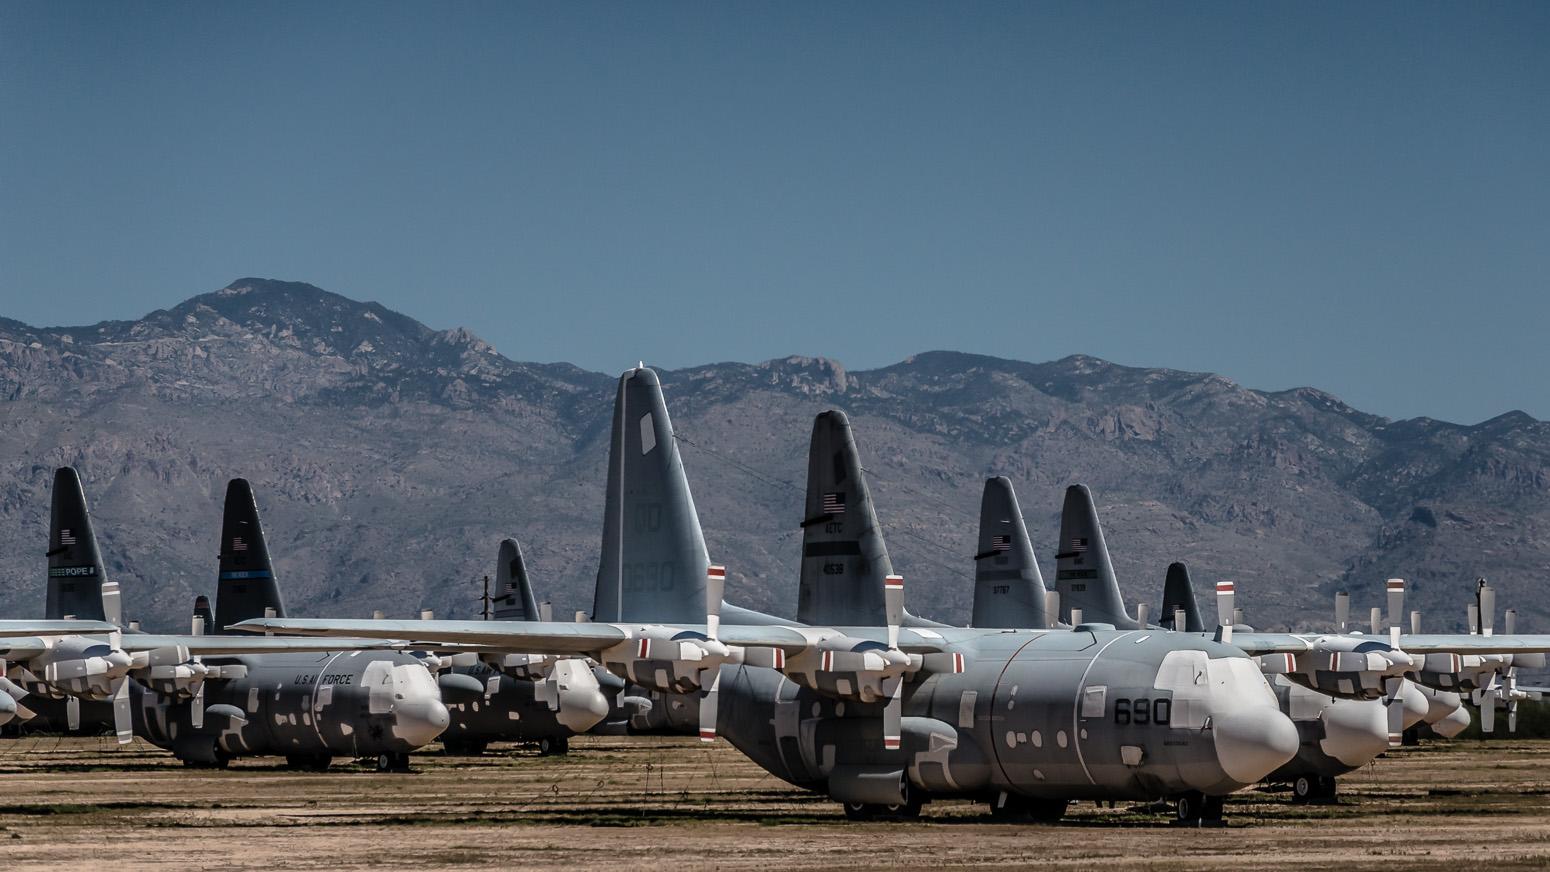 Lockheed C-130 Hercules, The Boneyard, Davis-Monthan Air Force Base, Tucson, USA